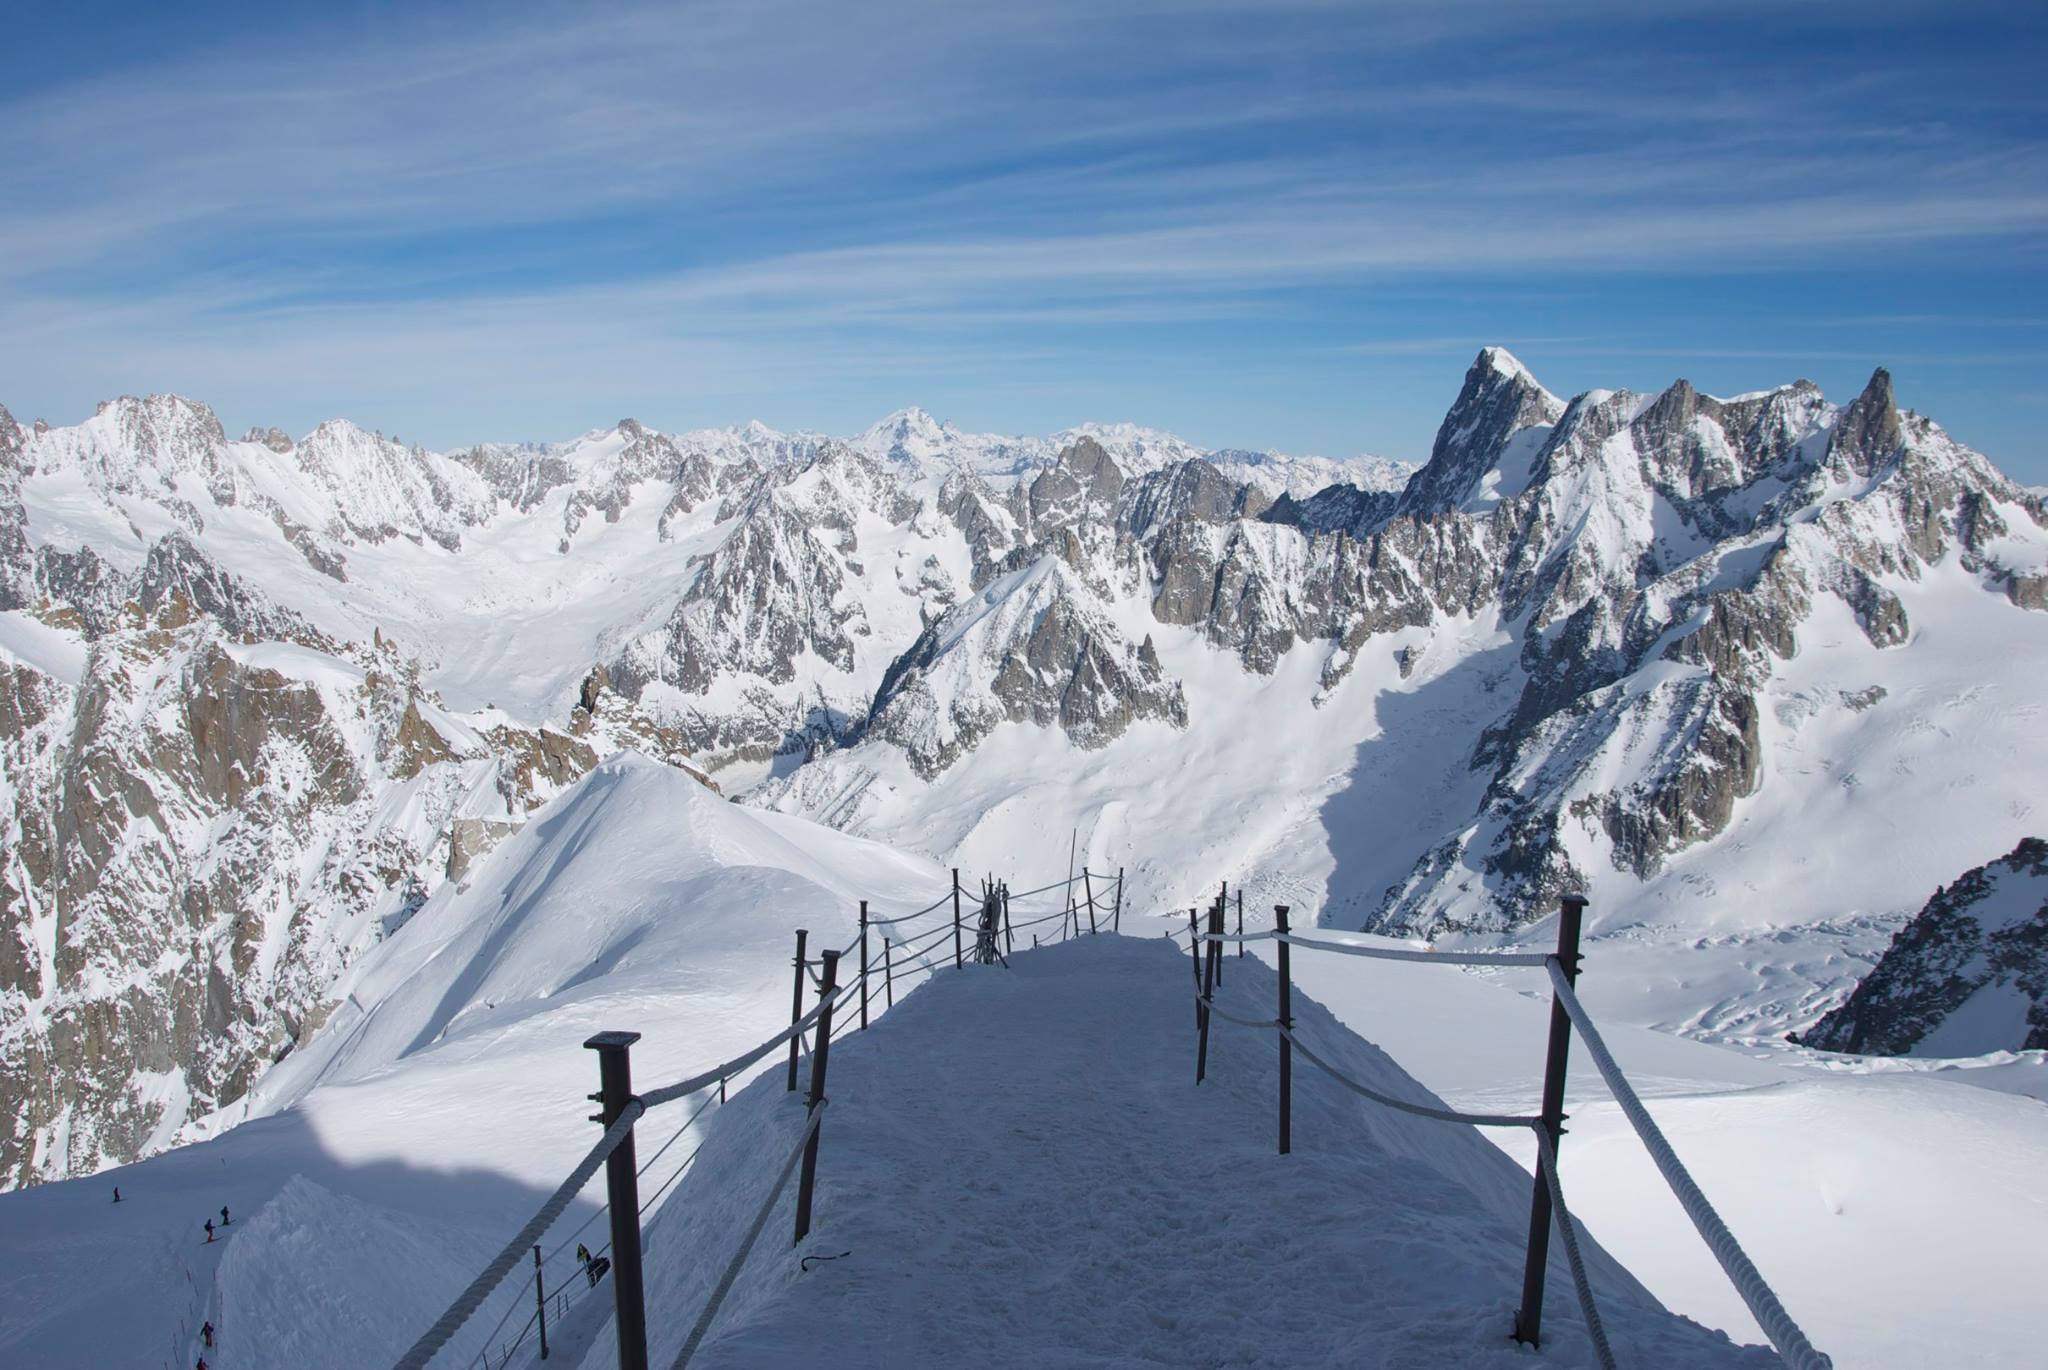 kirsteen-vallee-blanche-arete skiing in Chamonix